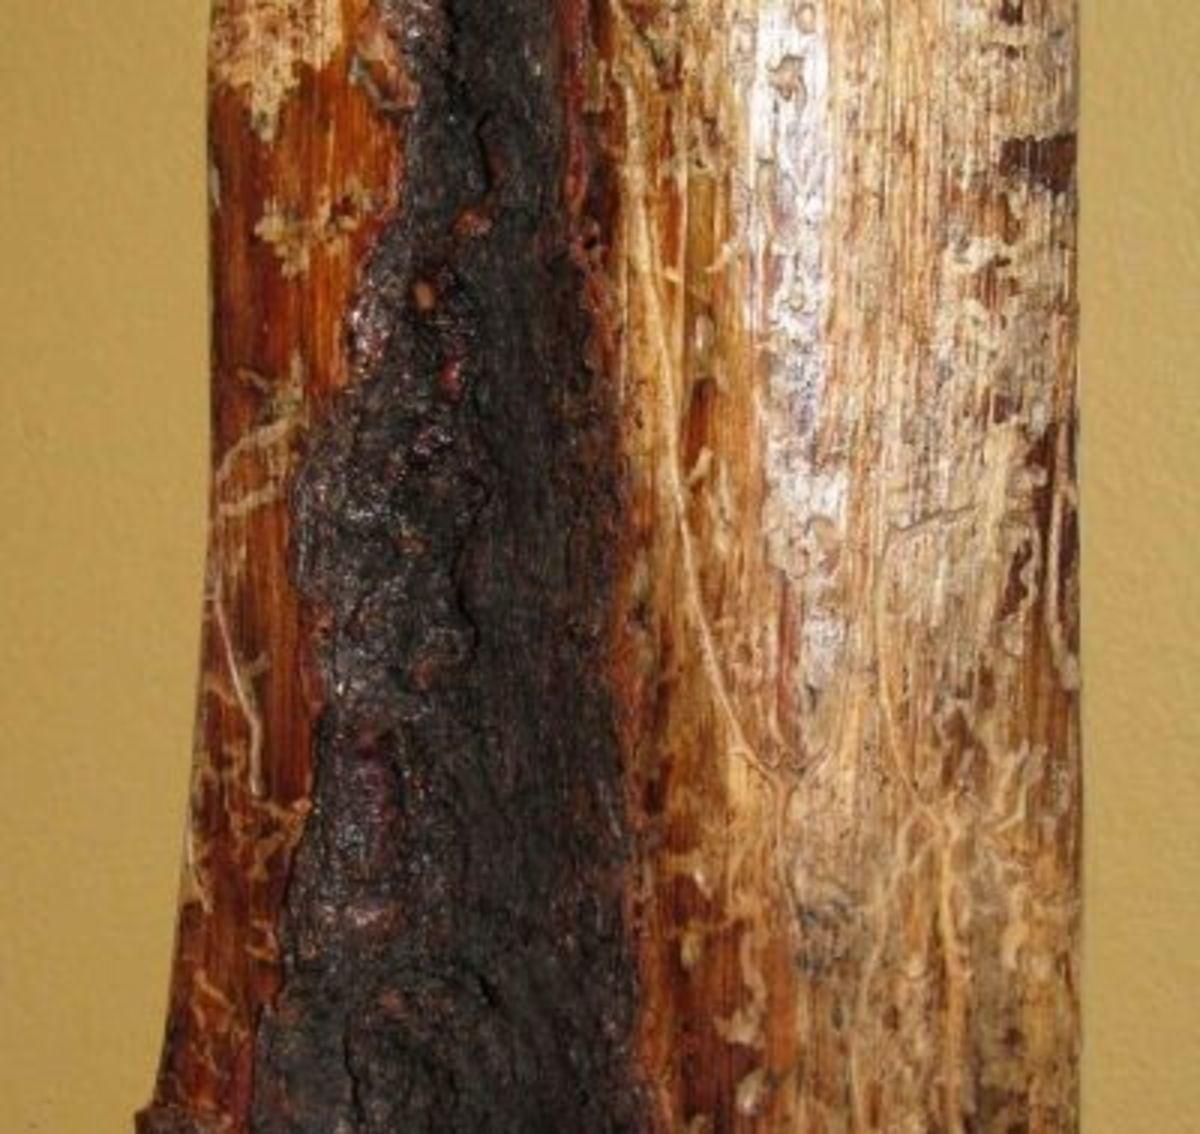 Mountain Pine Beetle